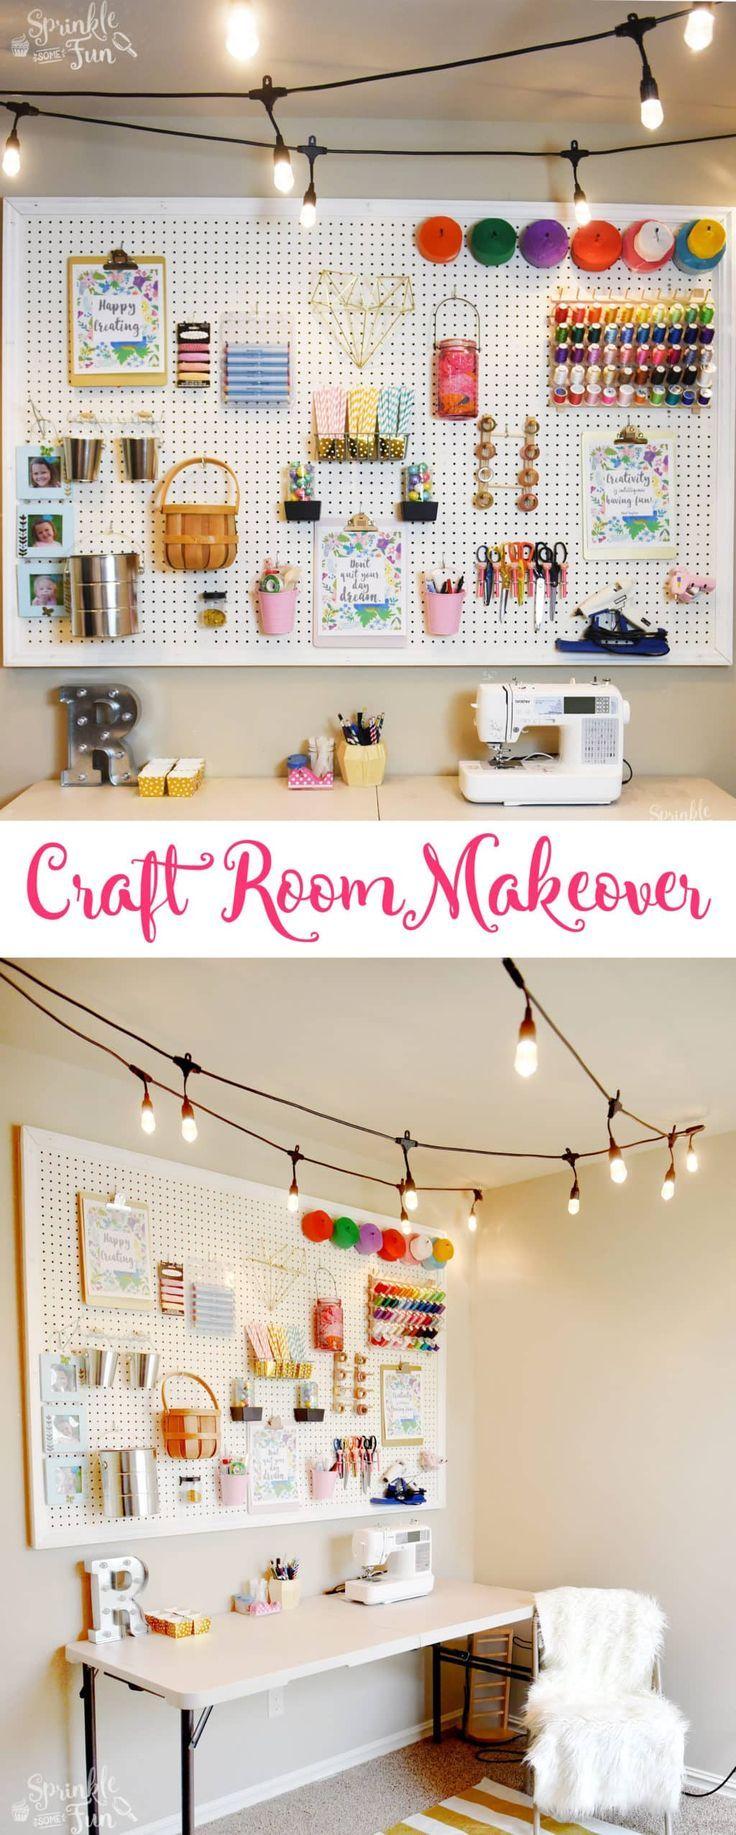 Craft Room Makeover with Café Lights ⋆ Sprinkle Some Fun